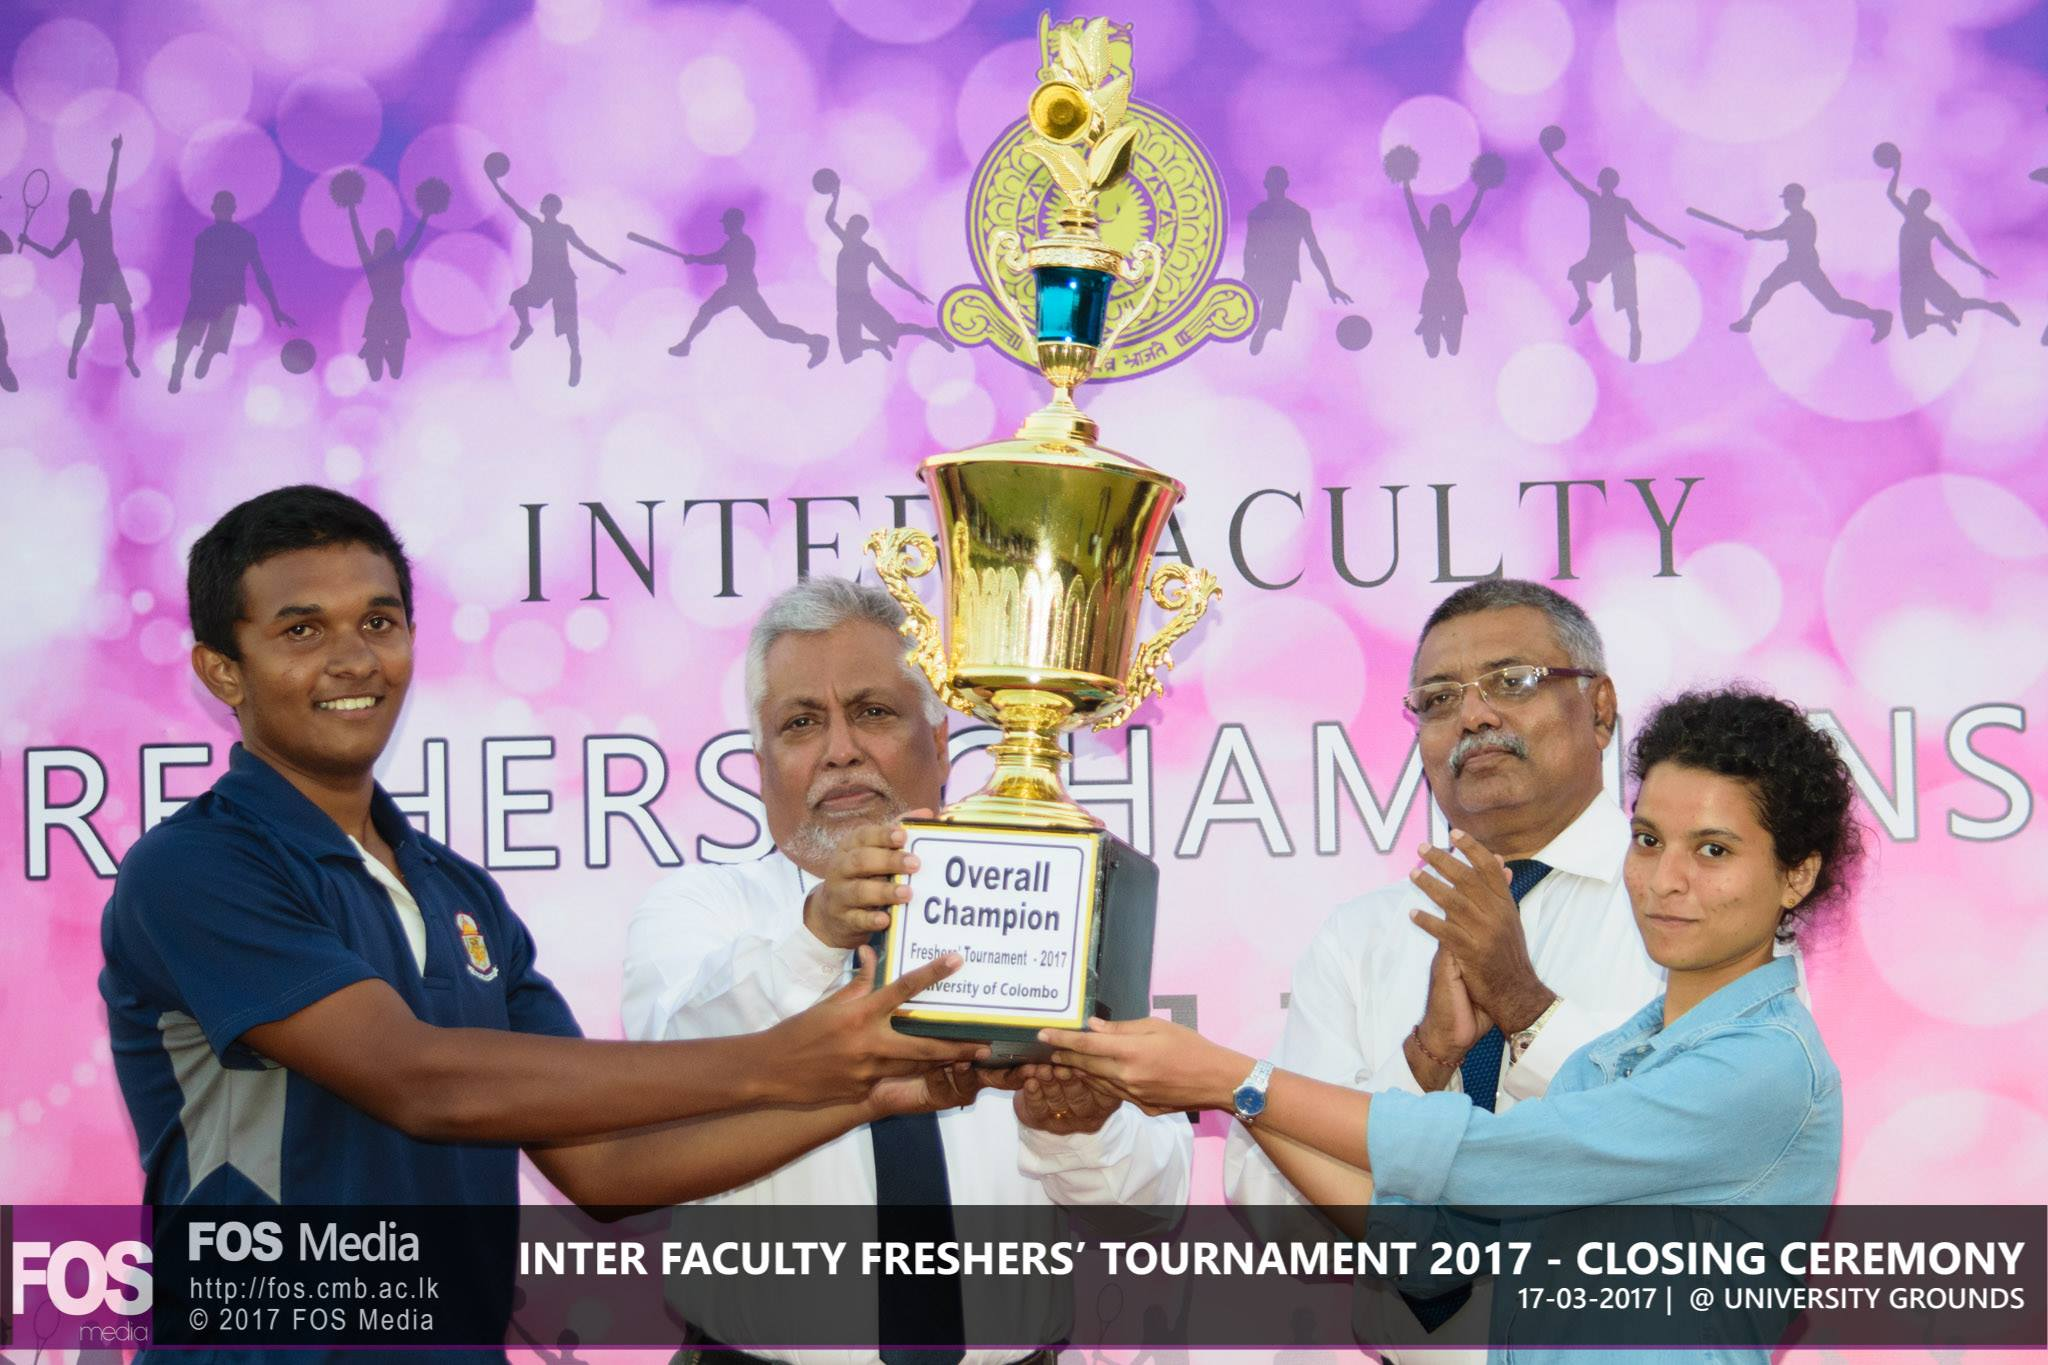 Freshers' Tournament 2017